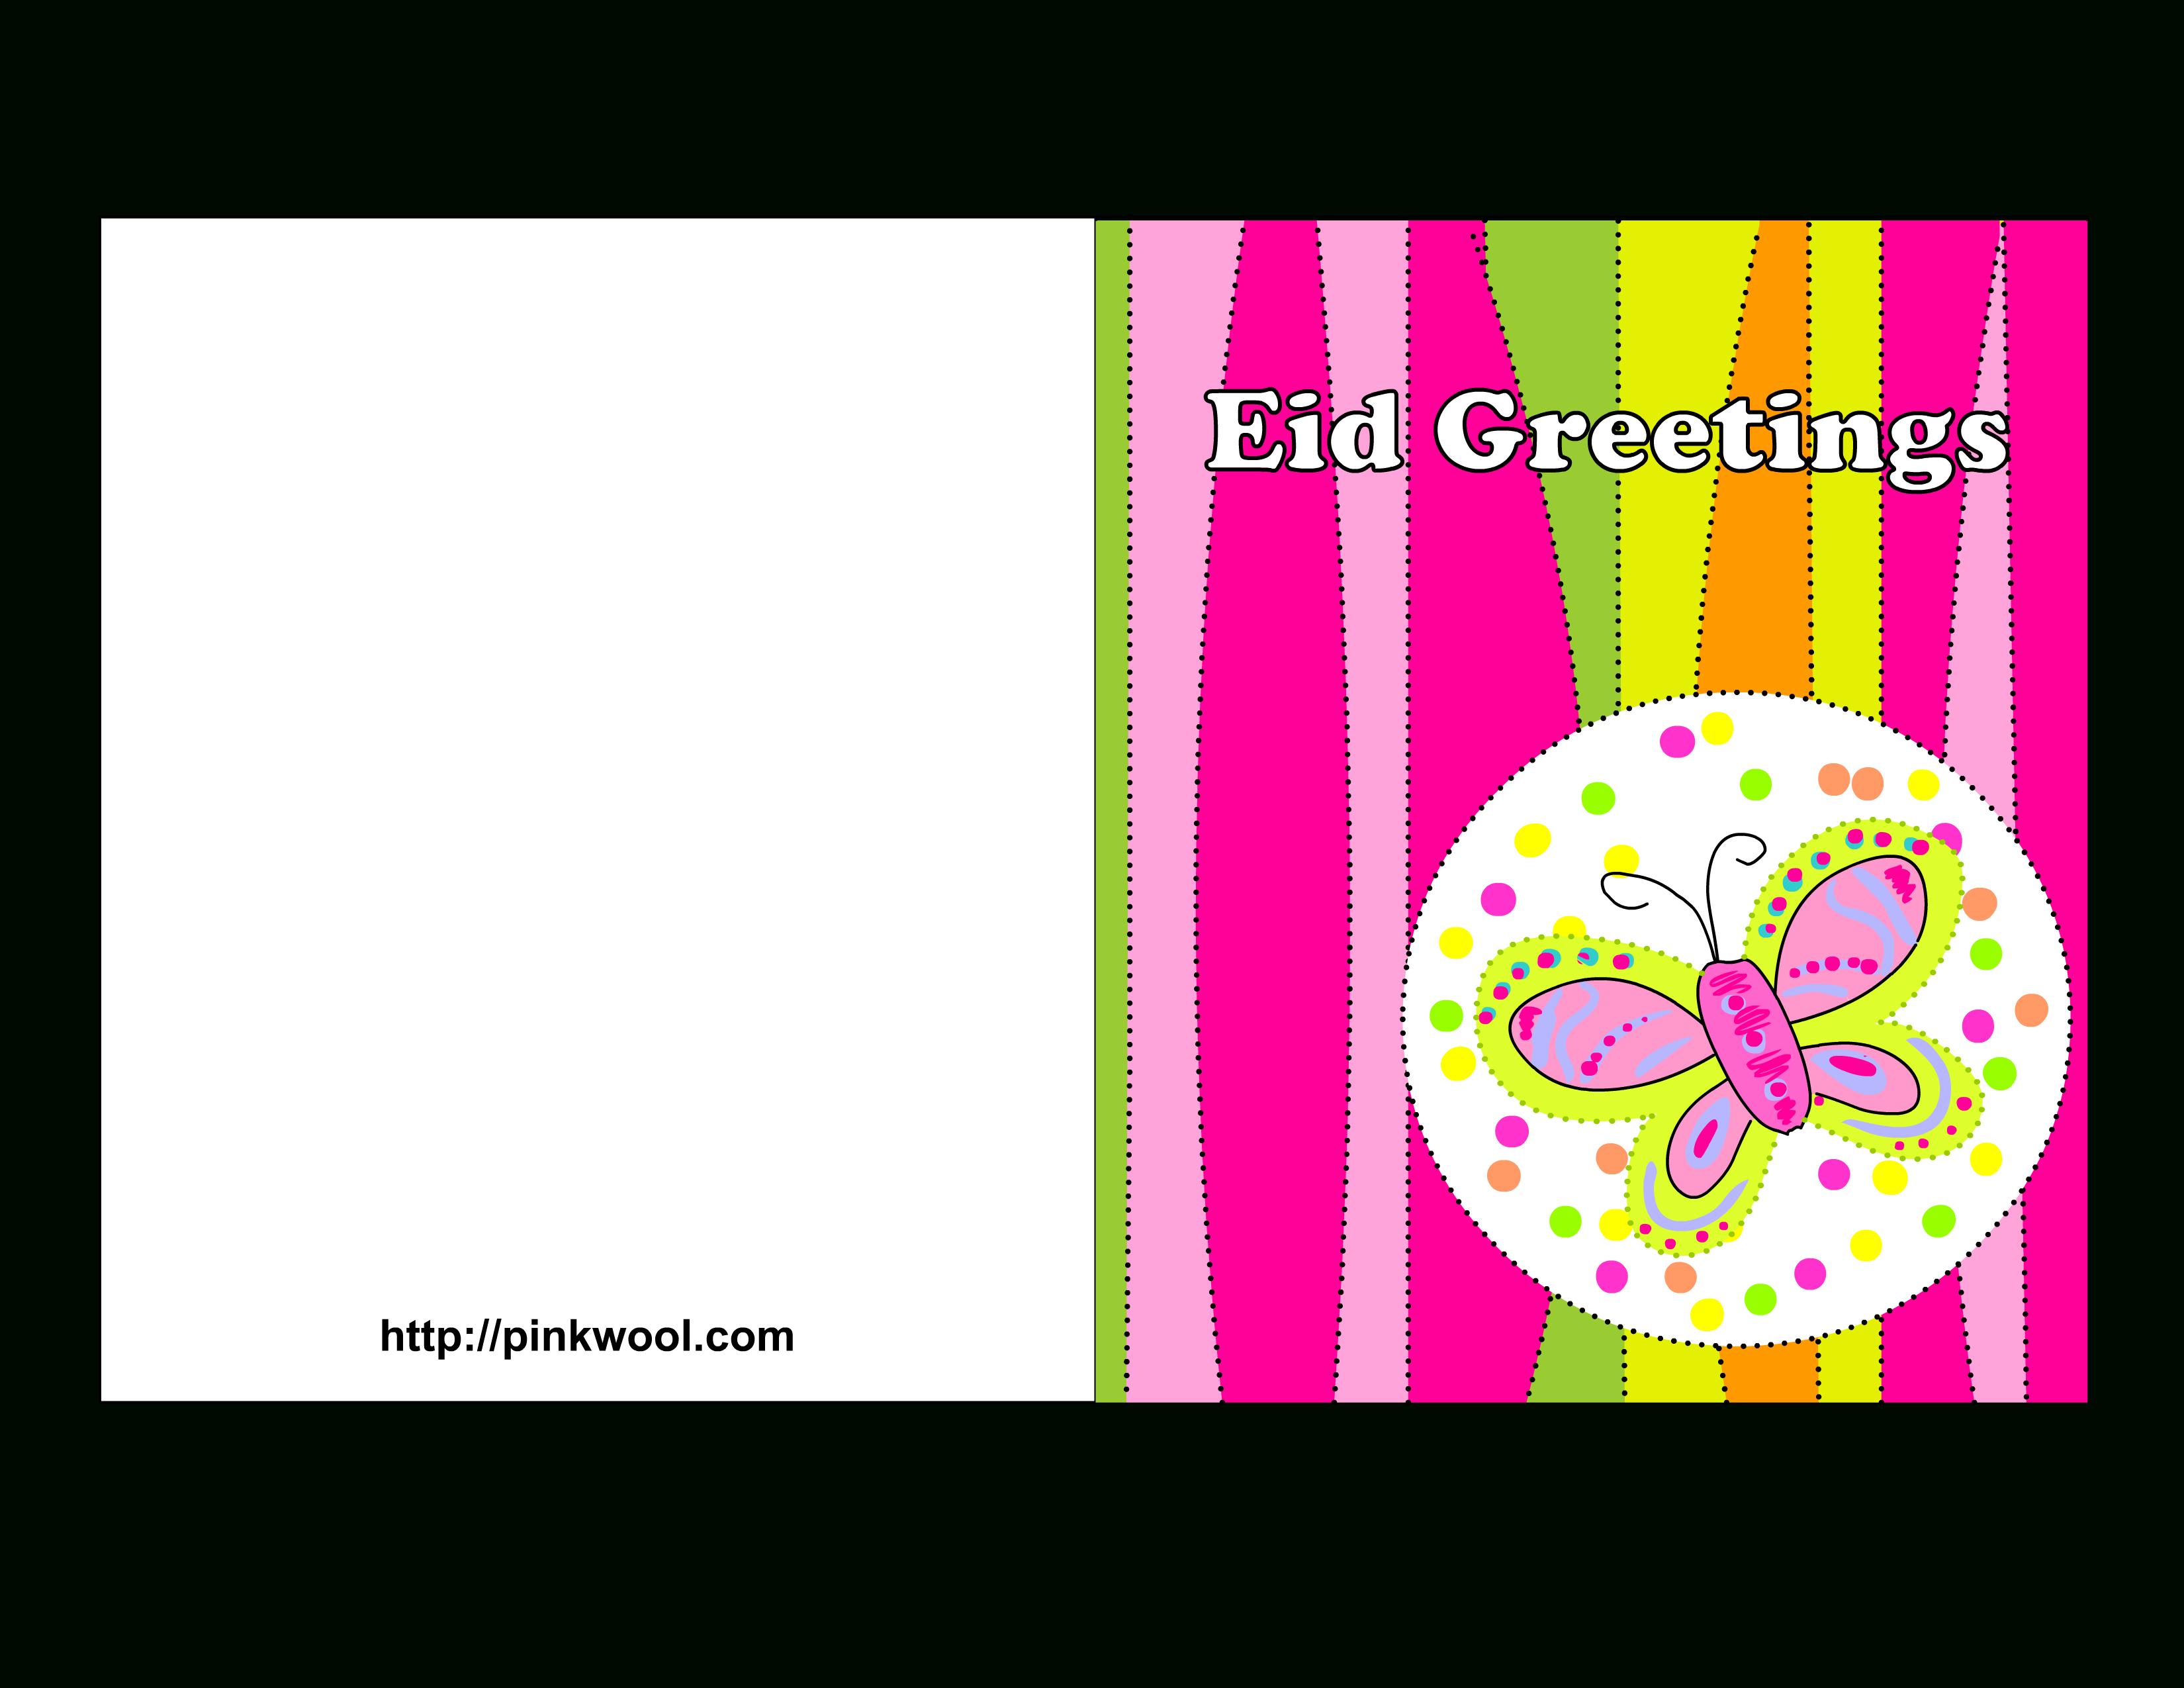 Free Printable Eid Greeting Cards - Free Printable Greeting Card Templates